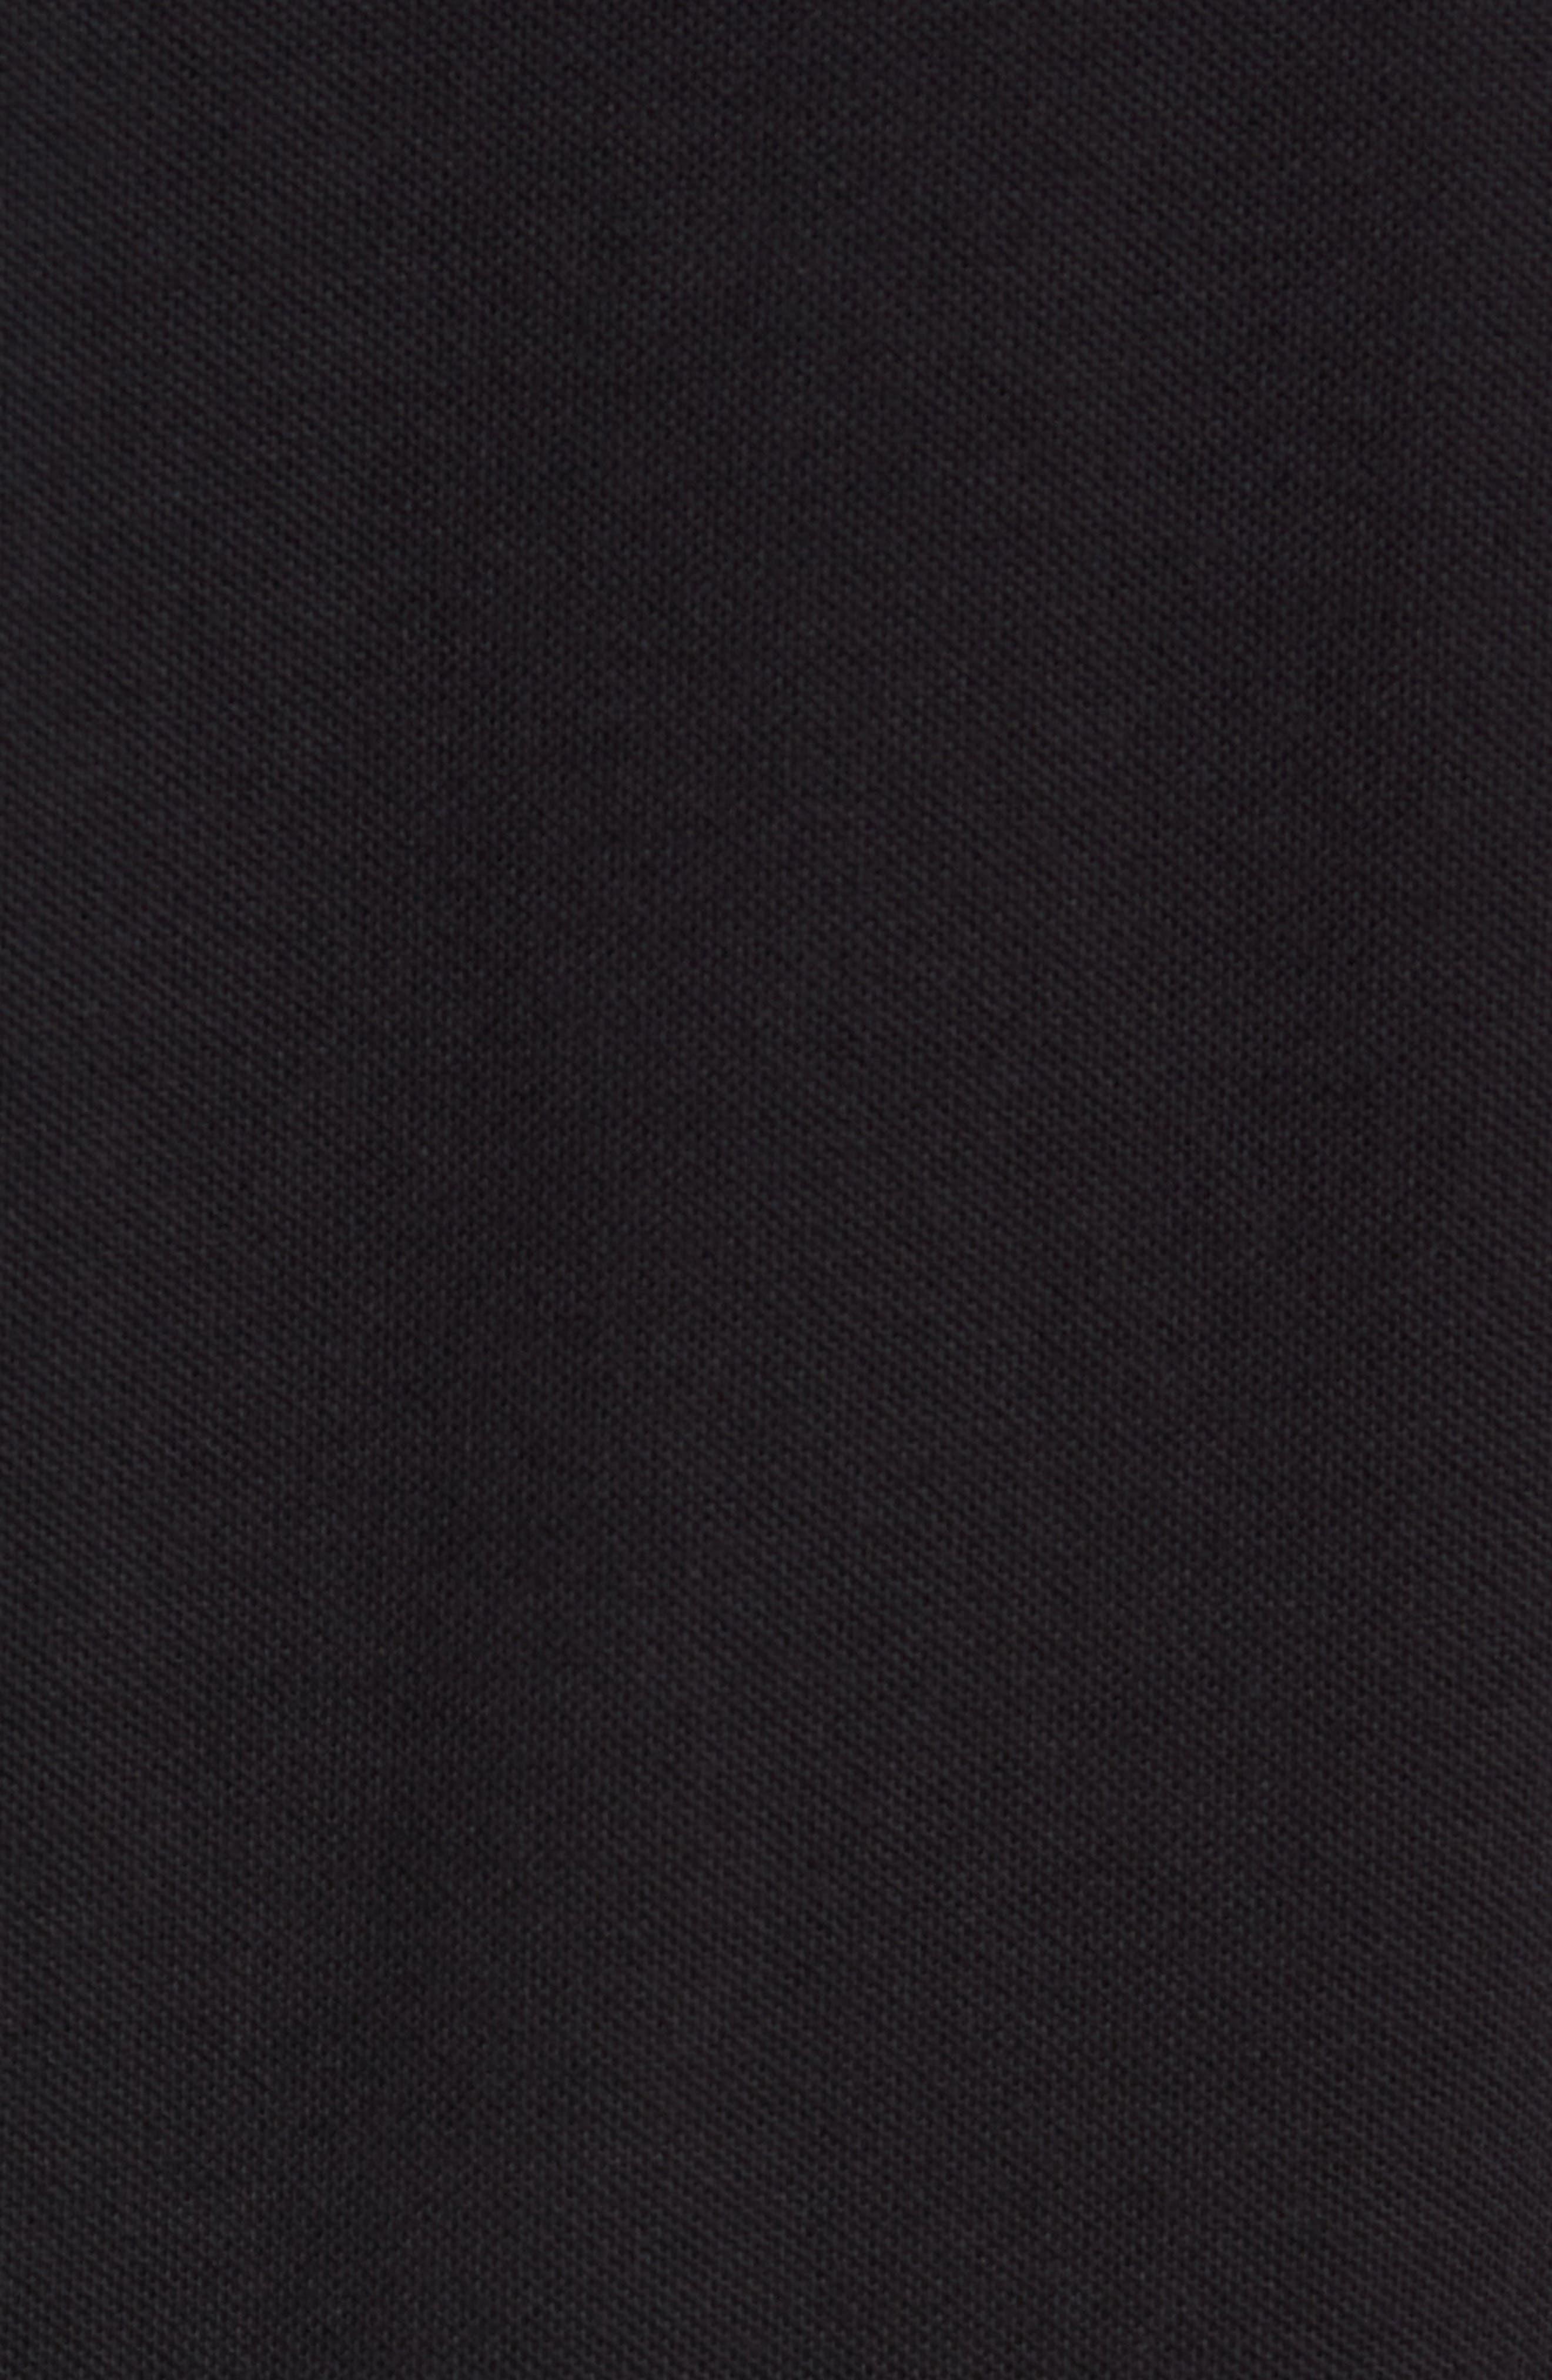 Long Sleeve Piqué T-Shirt,                             Alternate thumbnail 5, color,                             BLACK / CHAMPAGNE